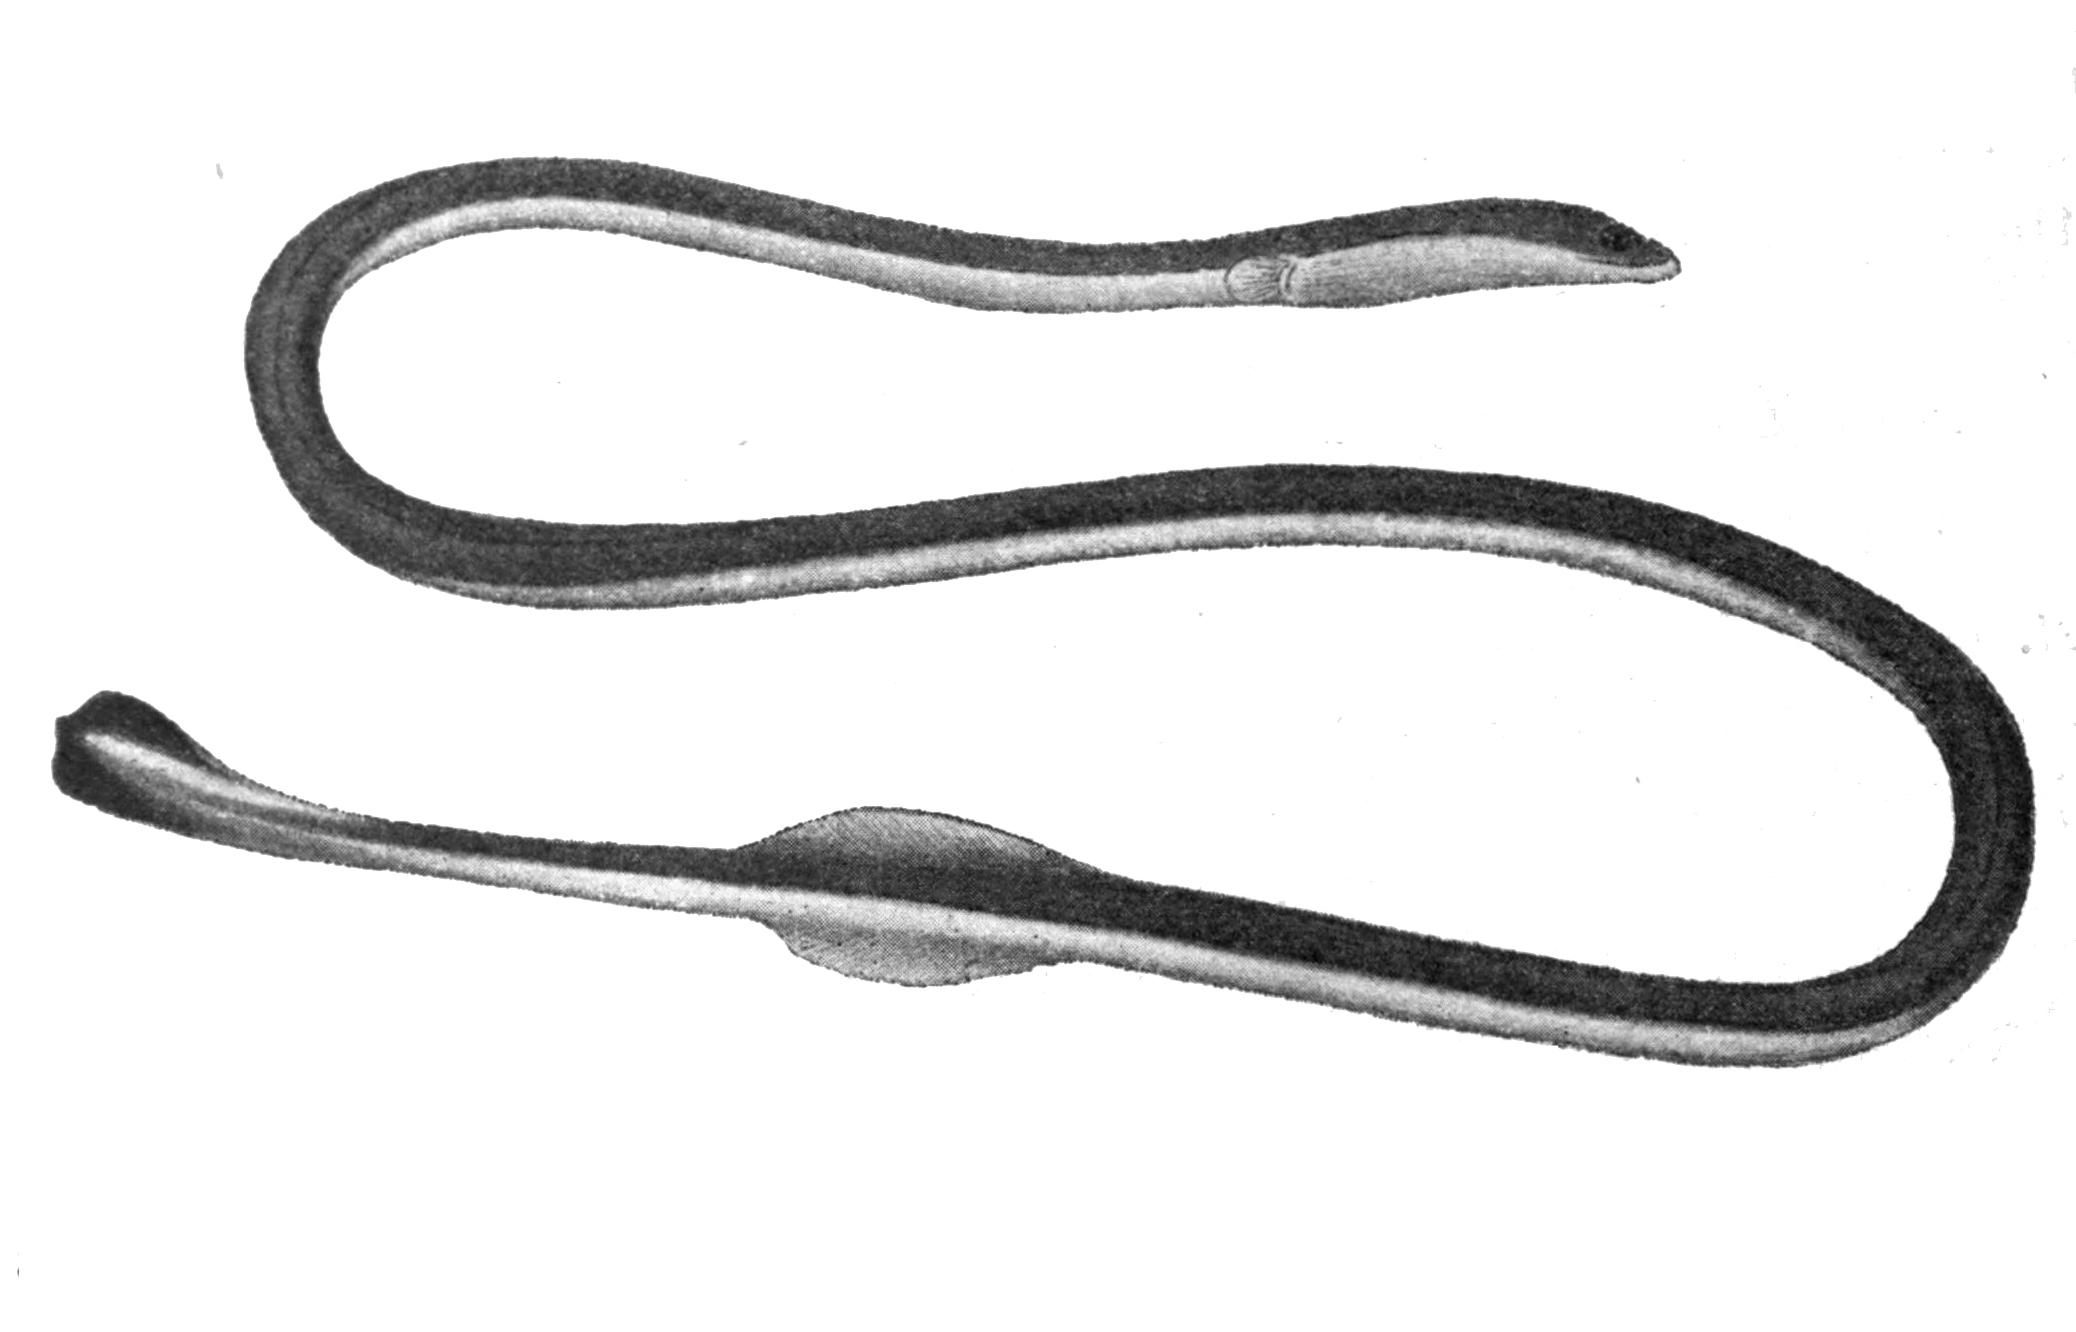 Image of Bicolor spaghetti eel